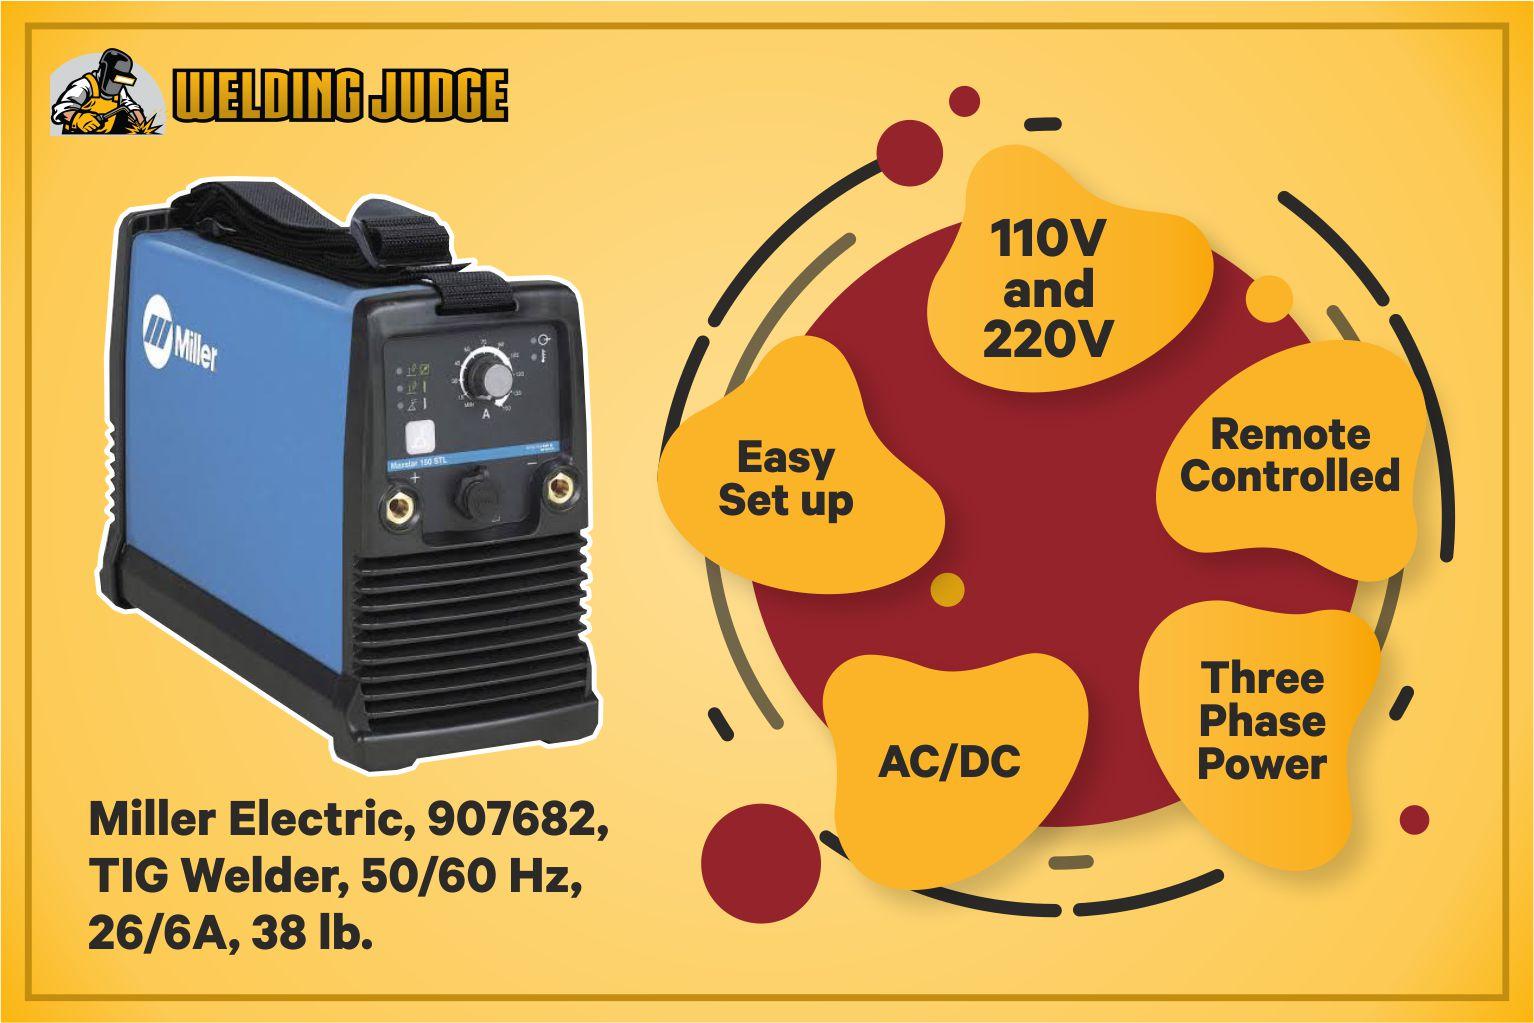 Miller Electric, 907682, TIG Welder, 50 60 Hz, 26 6A, 38 lb infographics